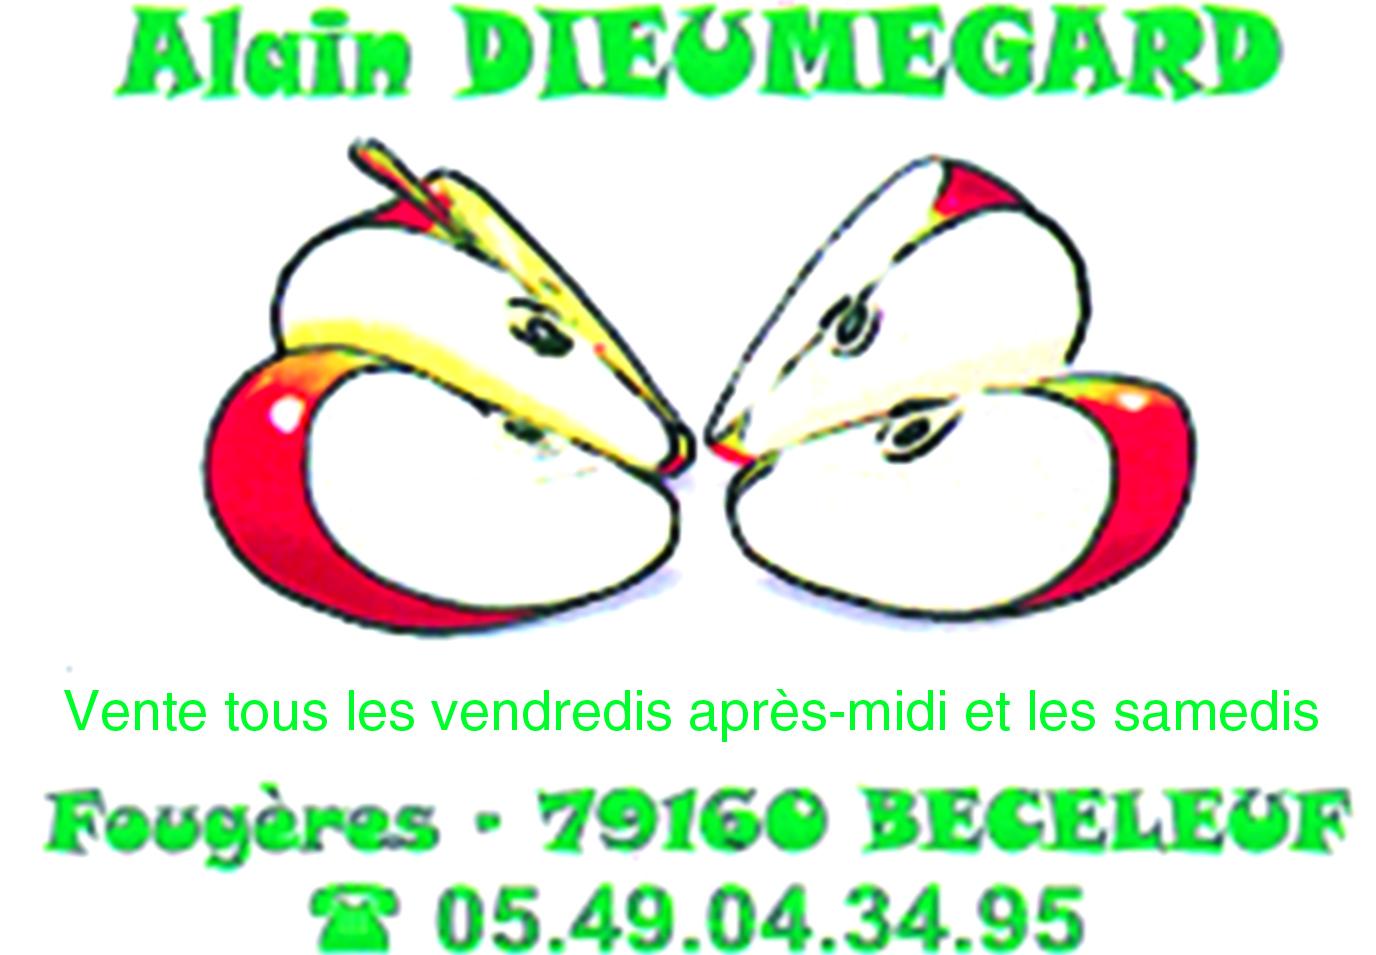 Alain Dieumegard Pompom